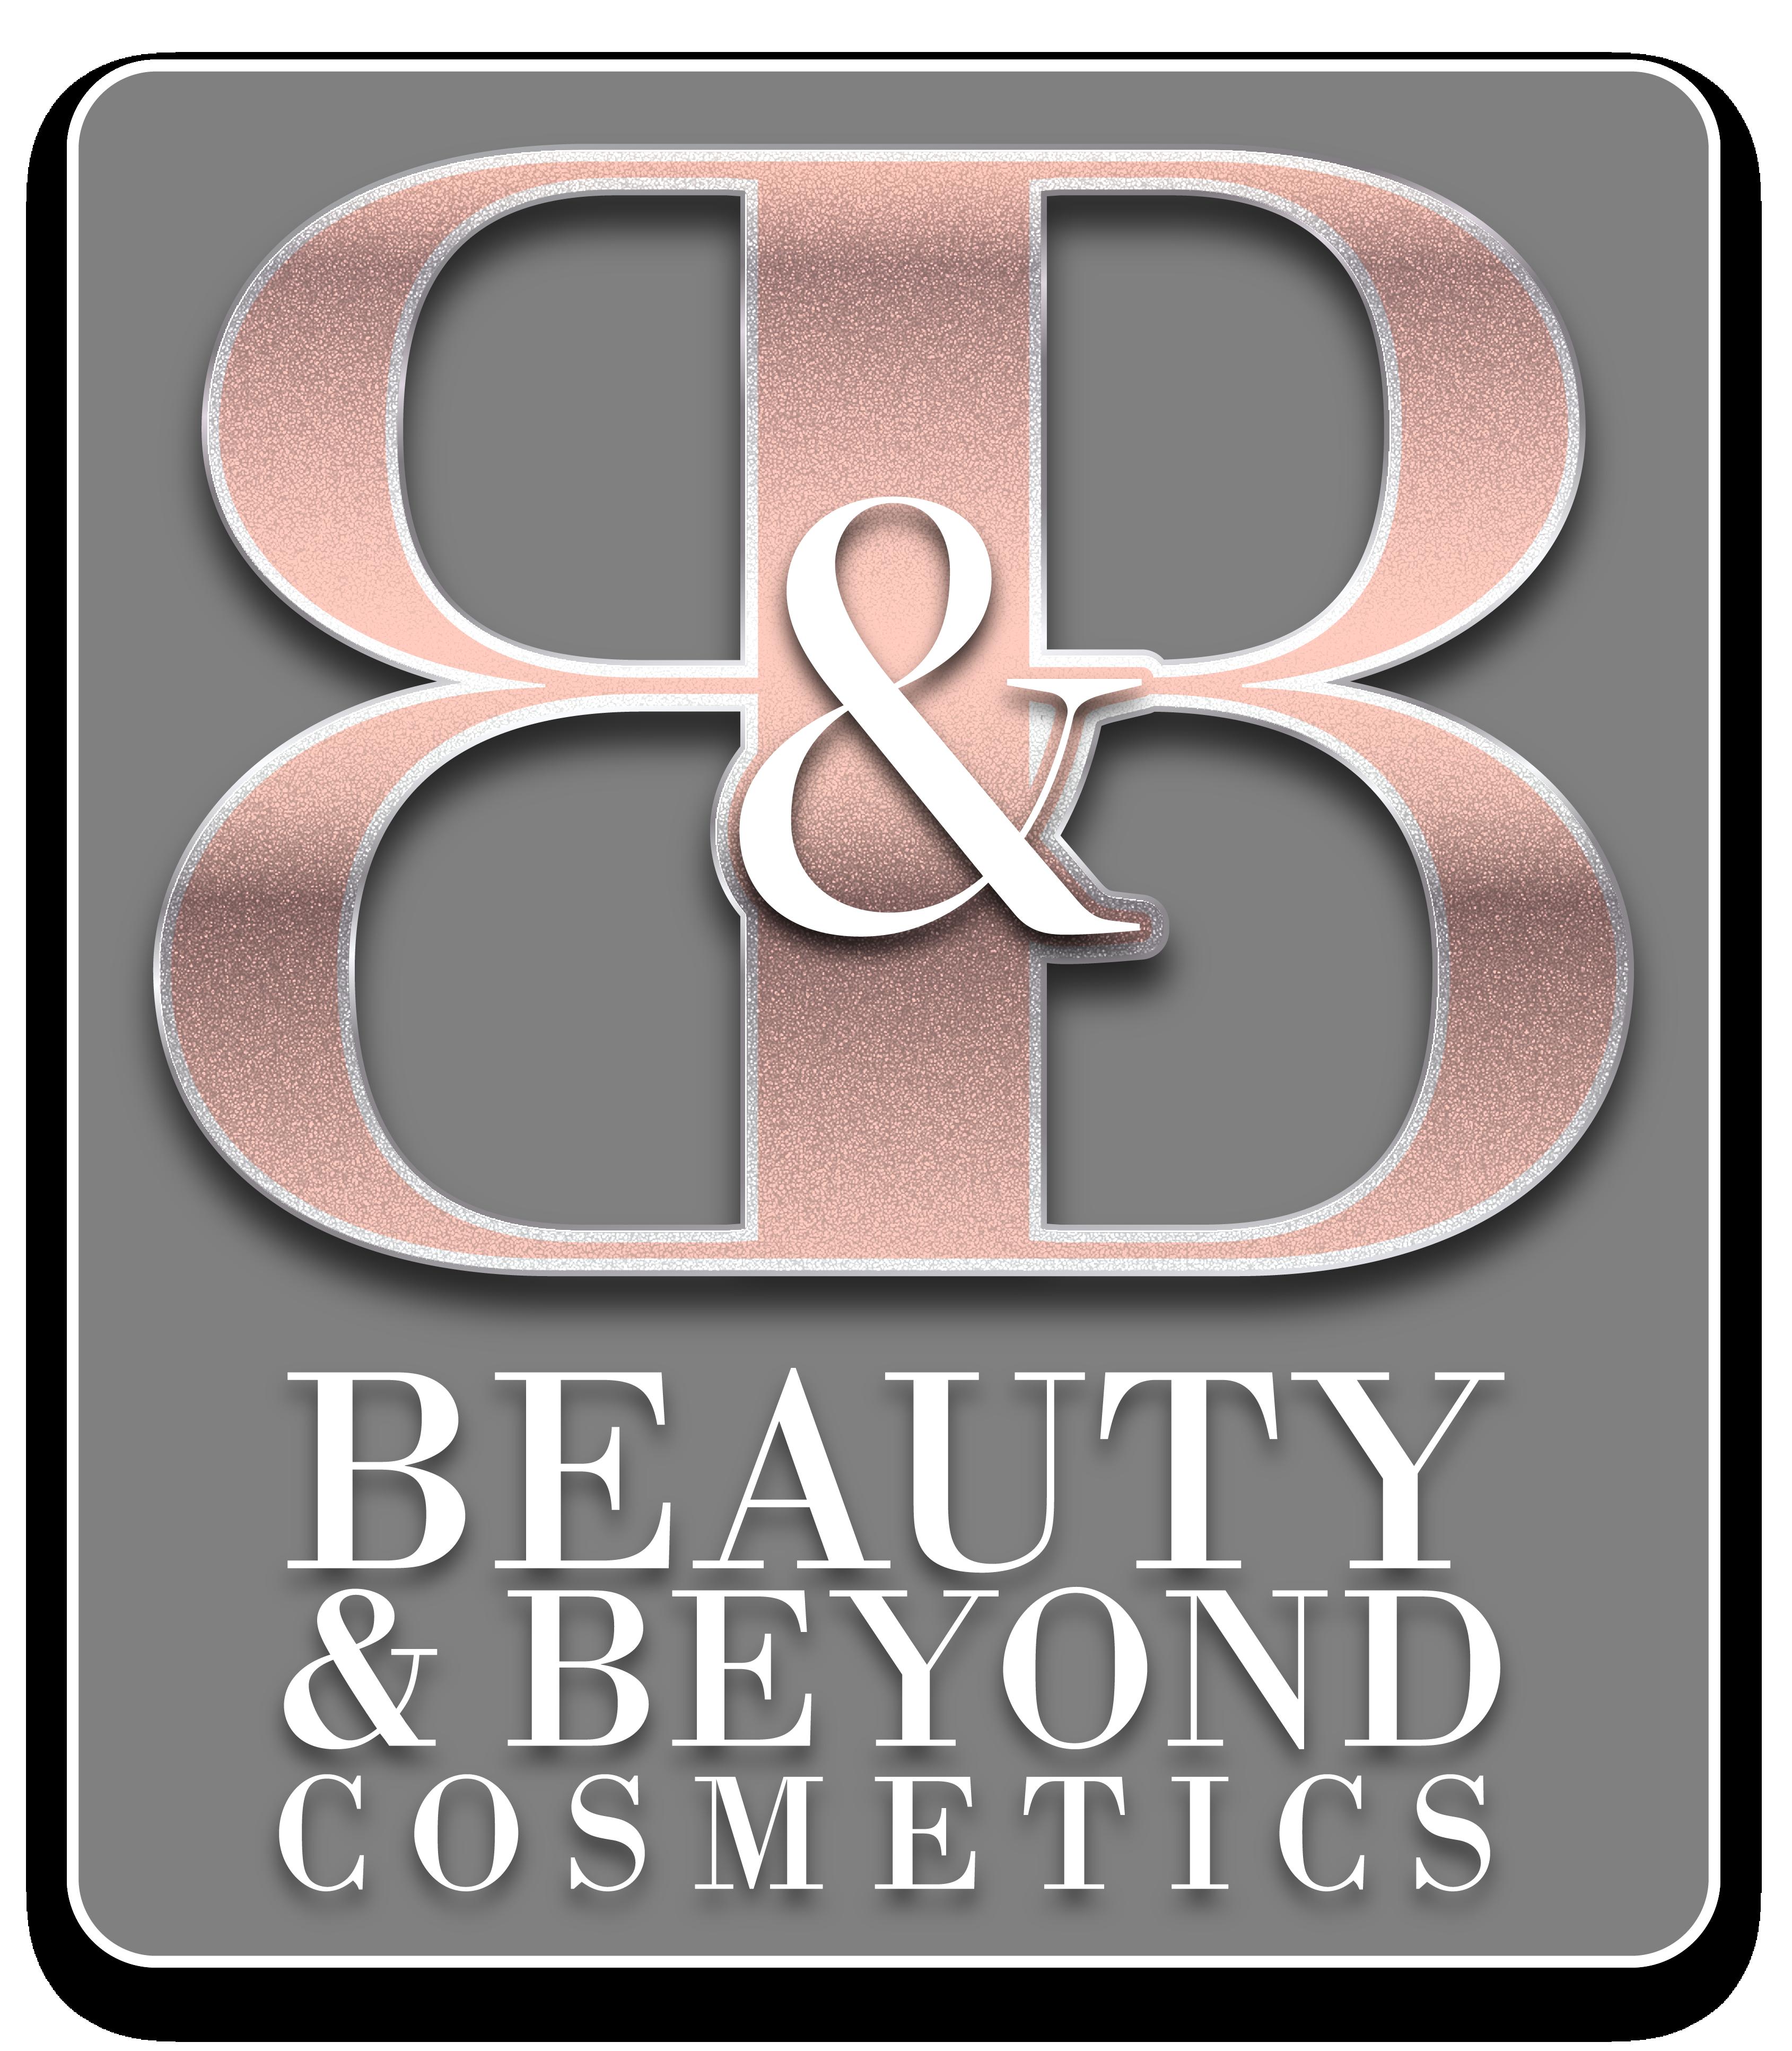 beauty and beyond cosmetics logo